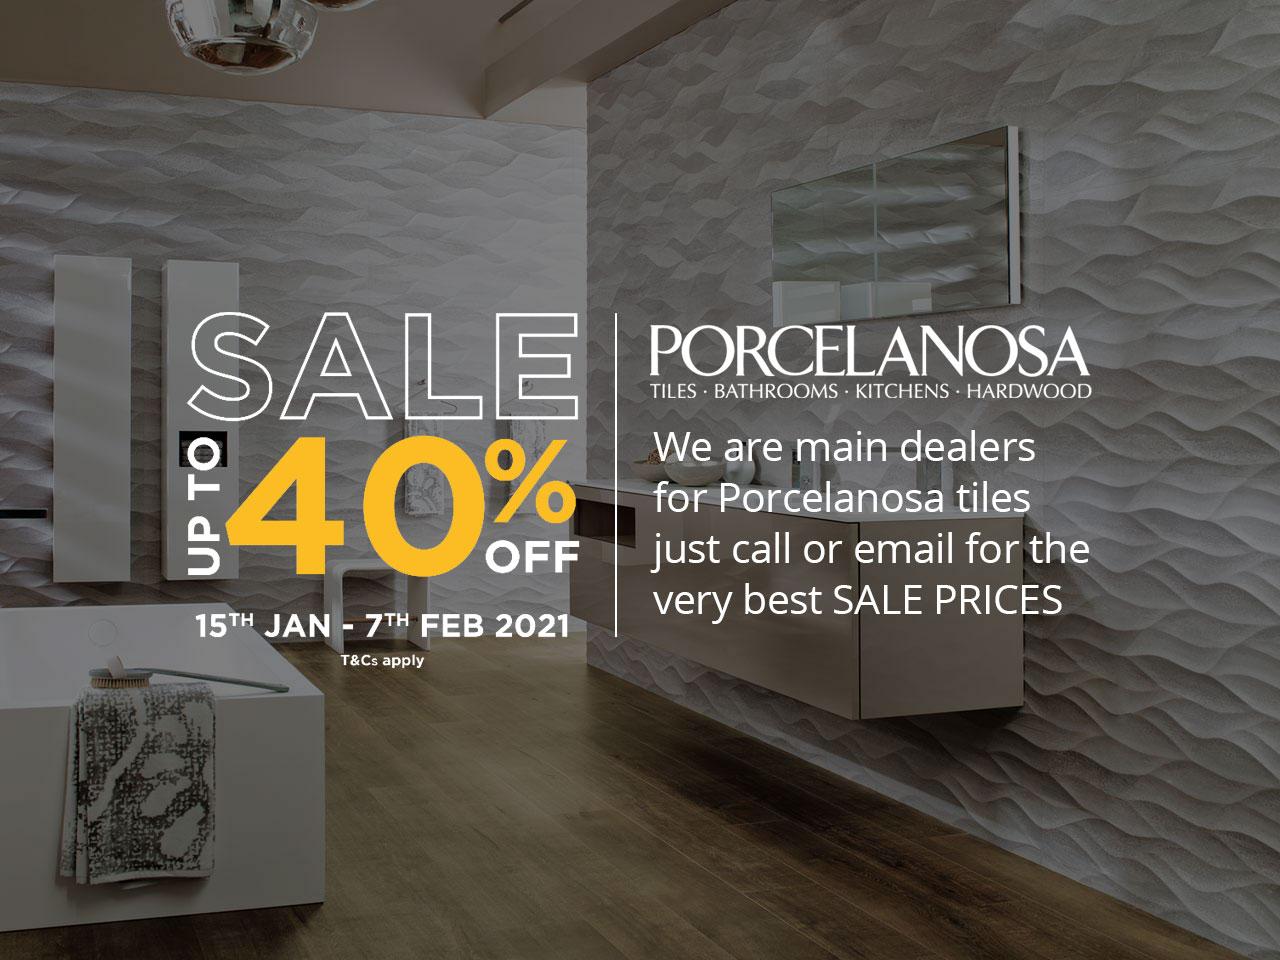 Porcelanosa Tiles Sale Up To 40% OFF